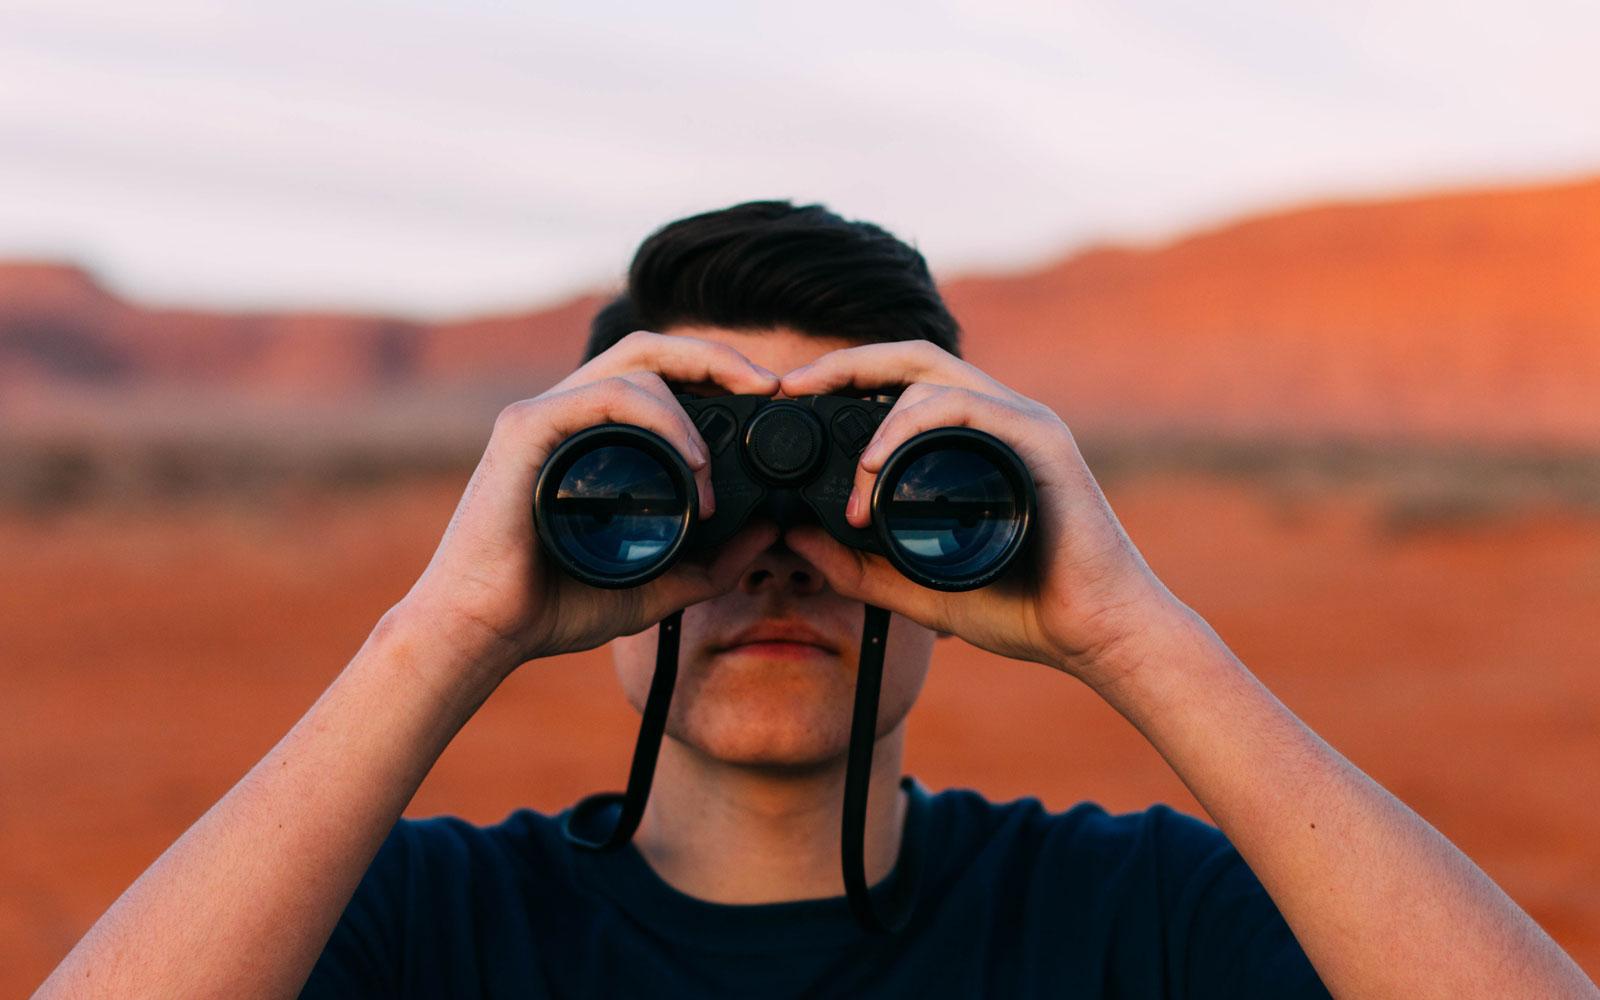 Man looking at the binoculars